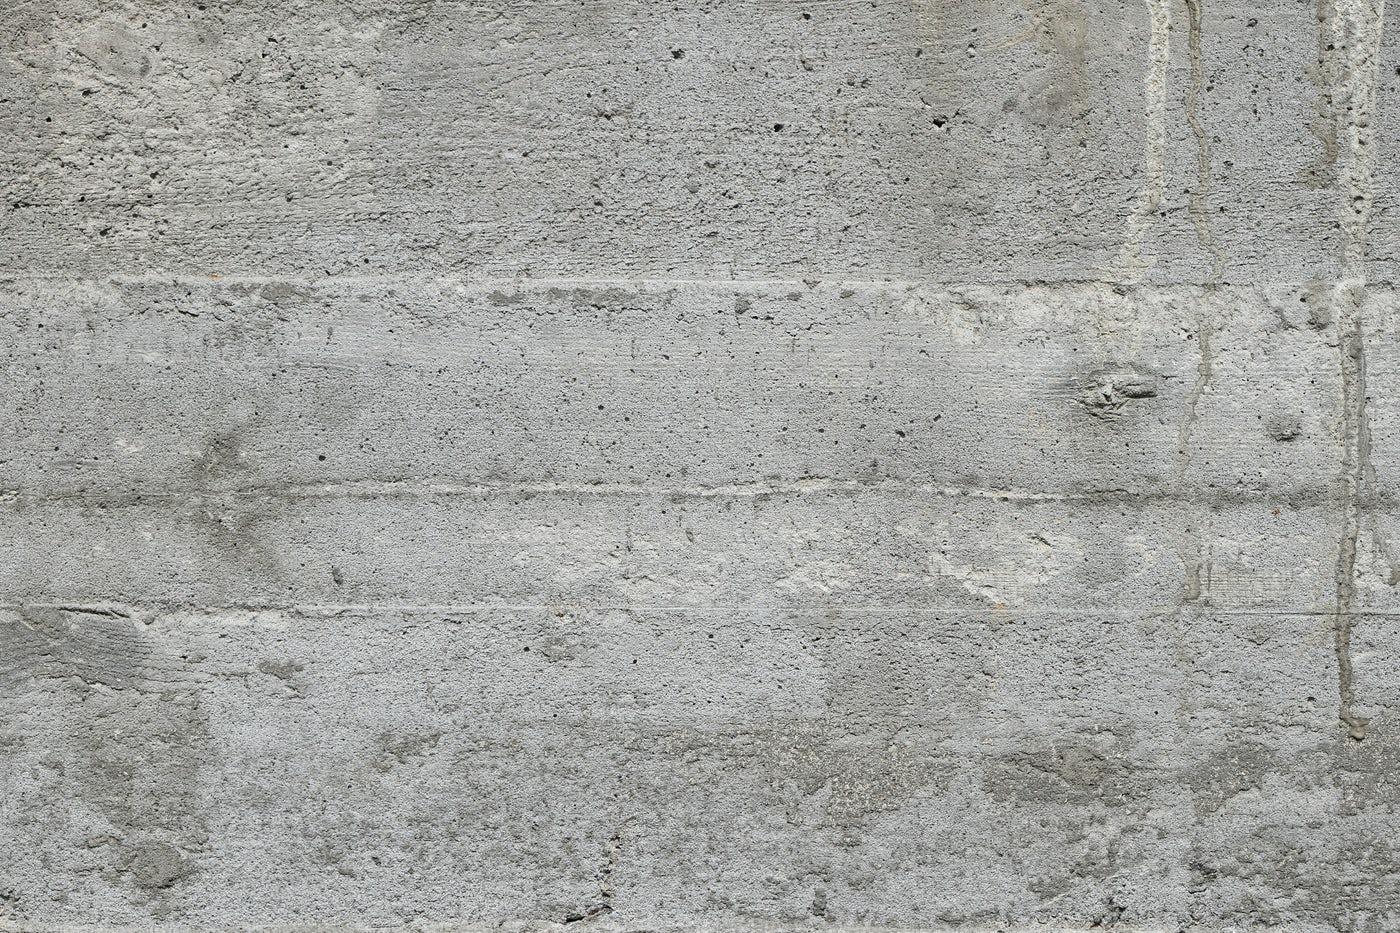 Uneven Concrete Background: Stock Photos